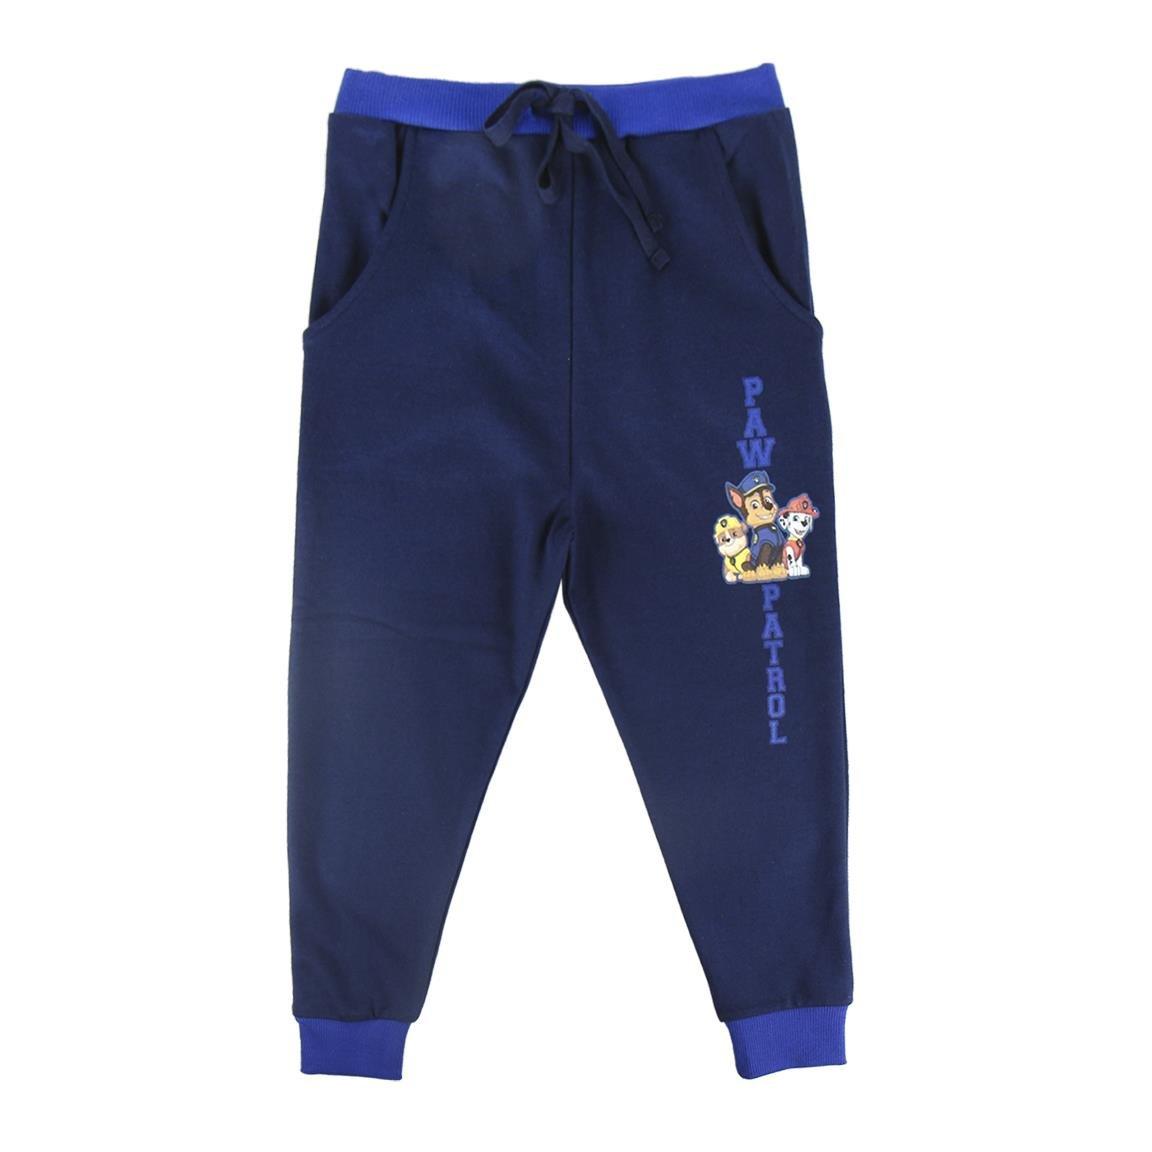 Pantaloni bambini Paw Patrol blu Cerdá